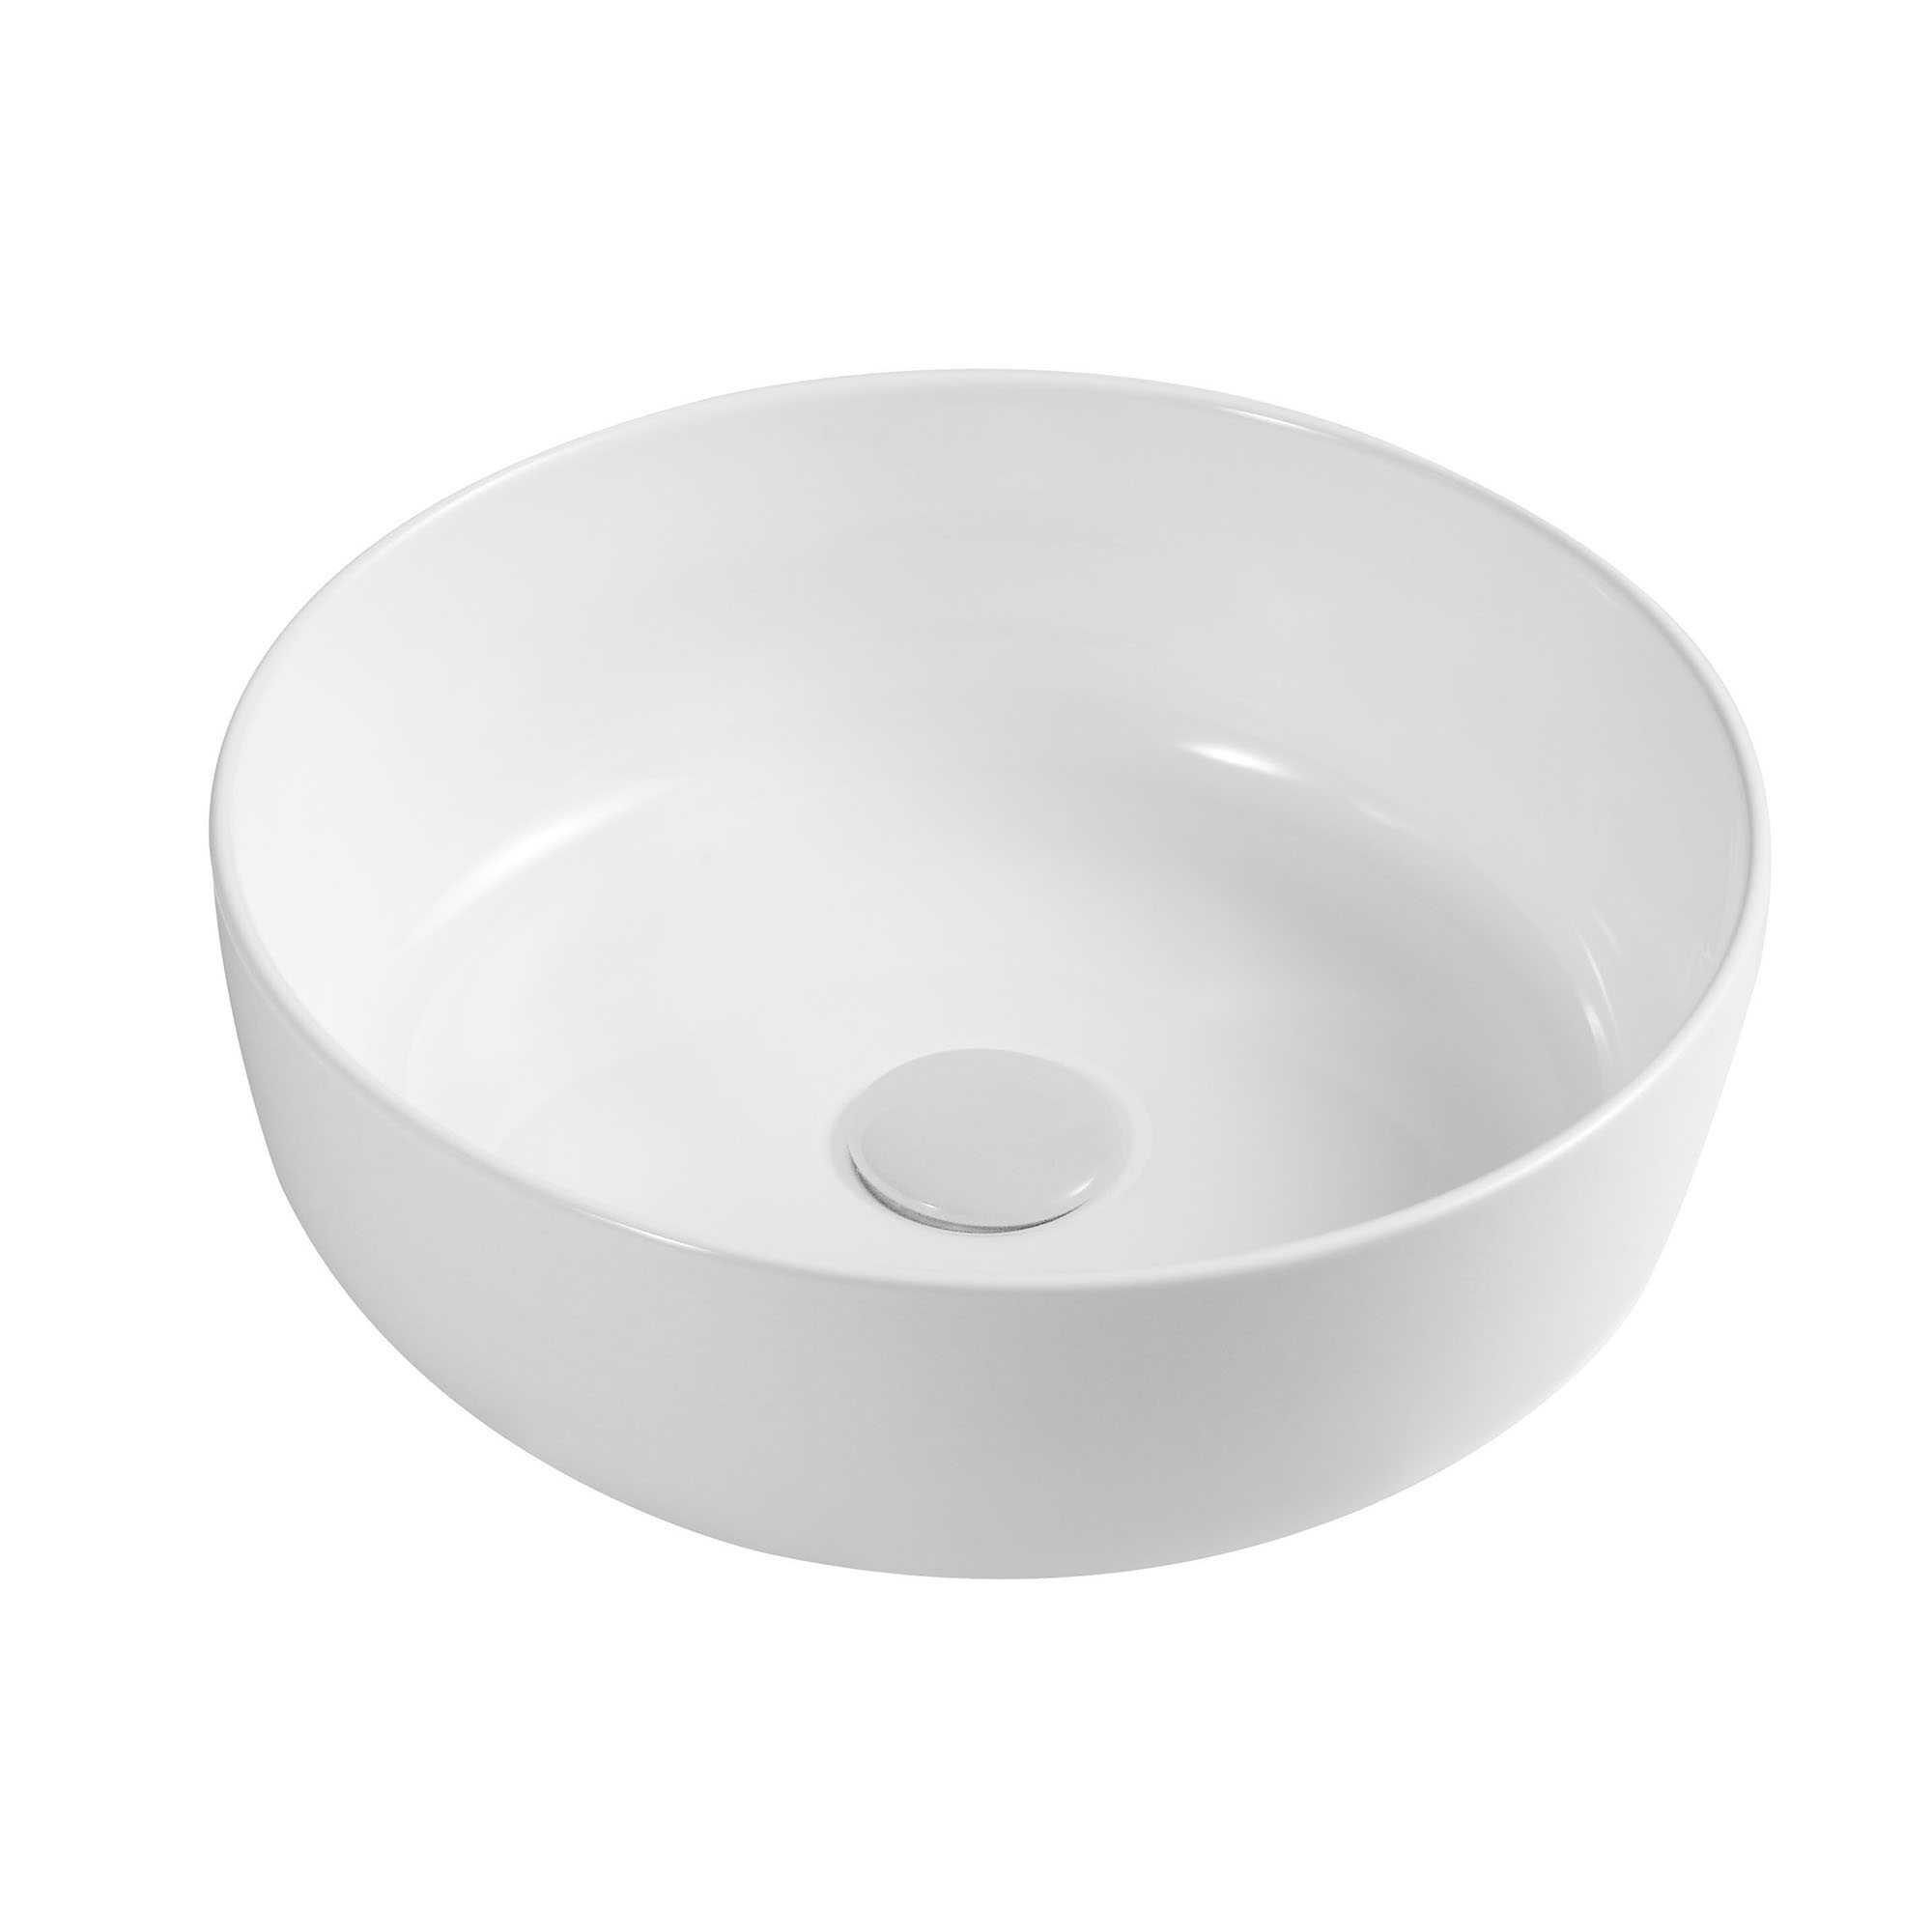 Lavabo da appoggio tondo Slim ceramica bianca diametro 33 cm